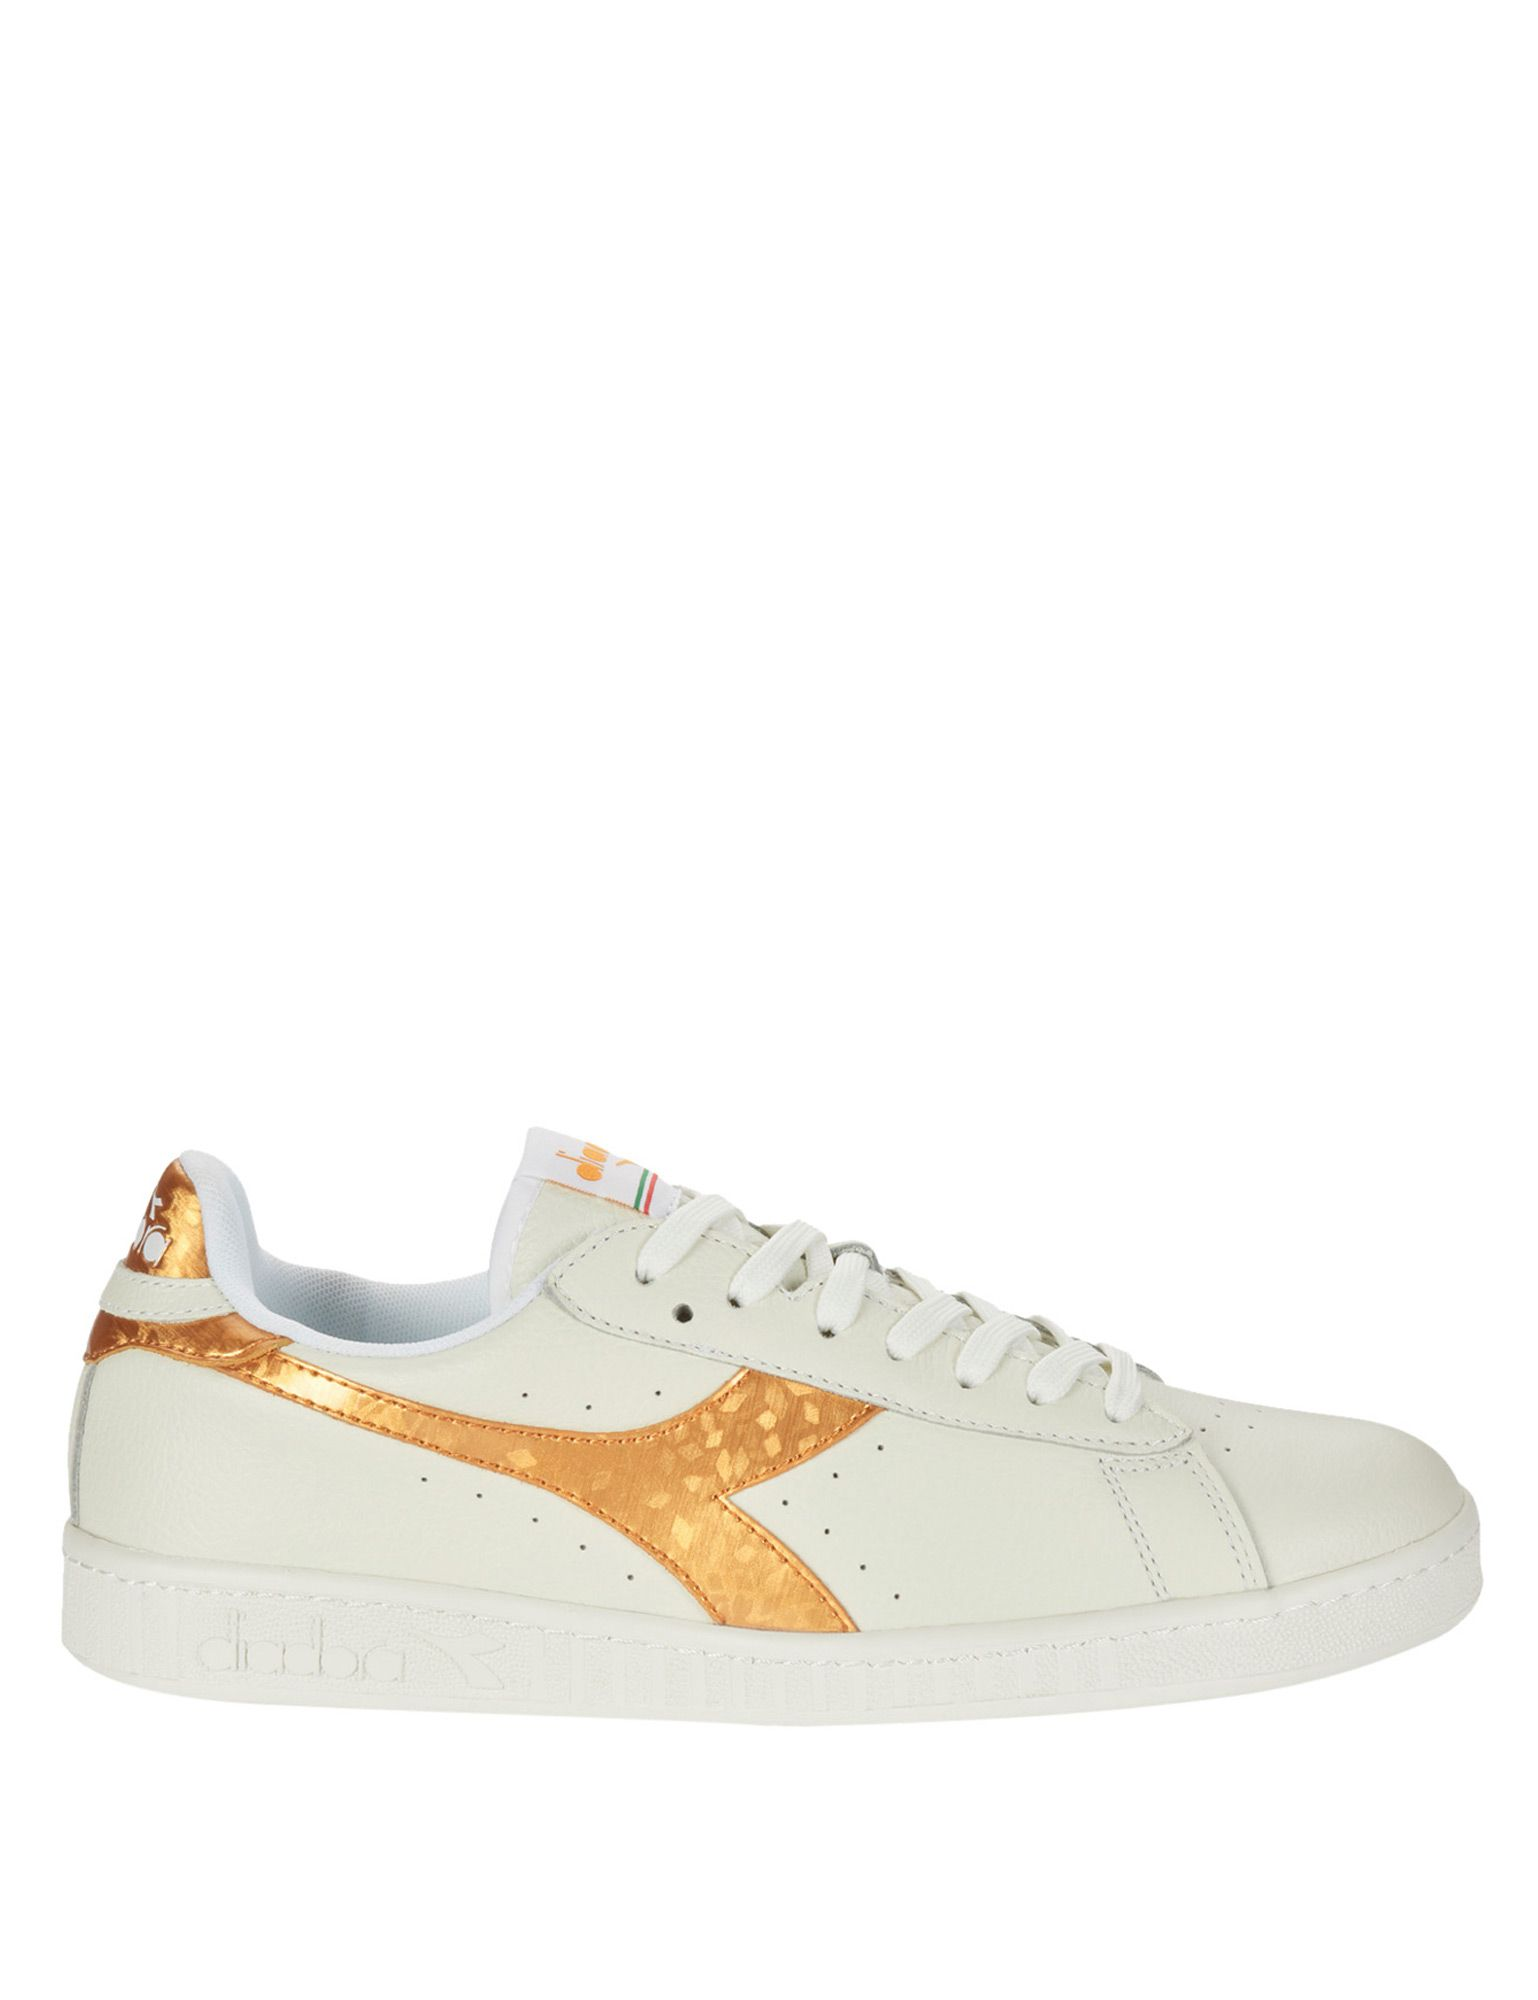 4d79b8a5bcf Game metallic sport γυναικεια λευκα παπουτσια | marilena | Pinterest ...